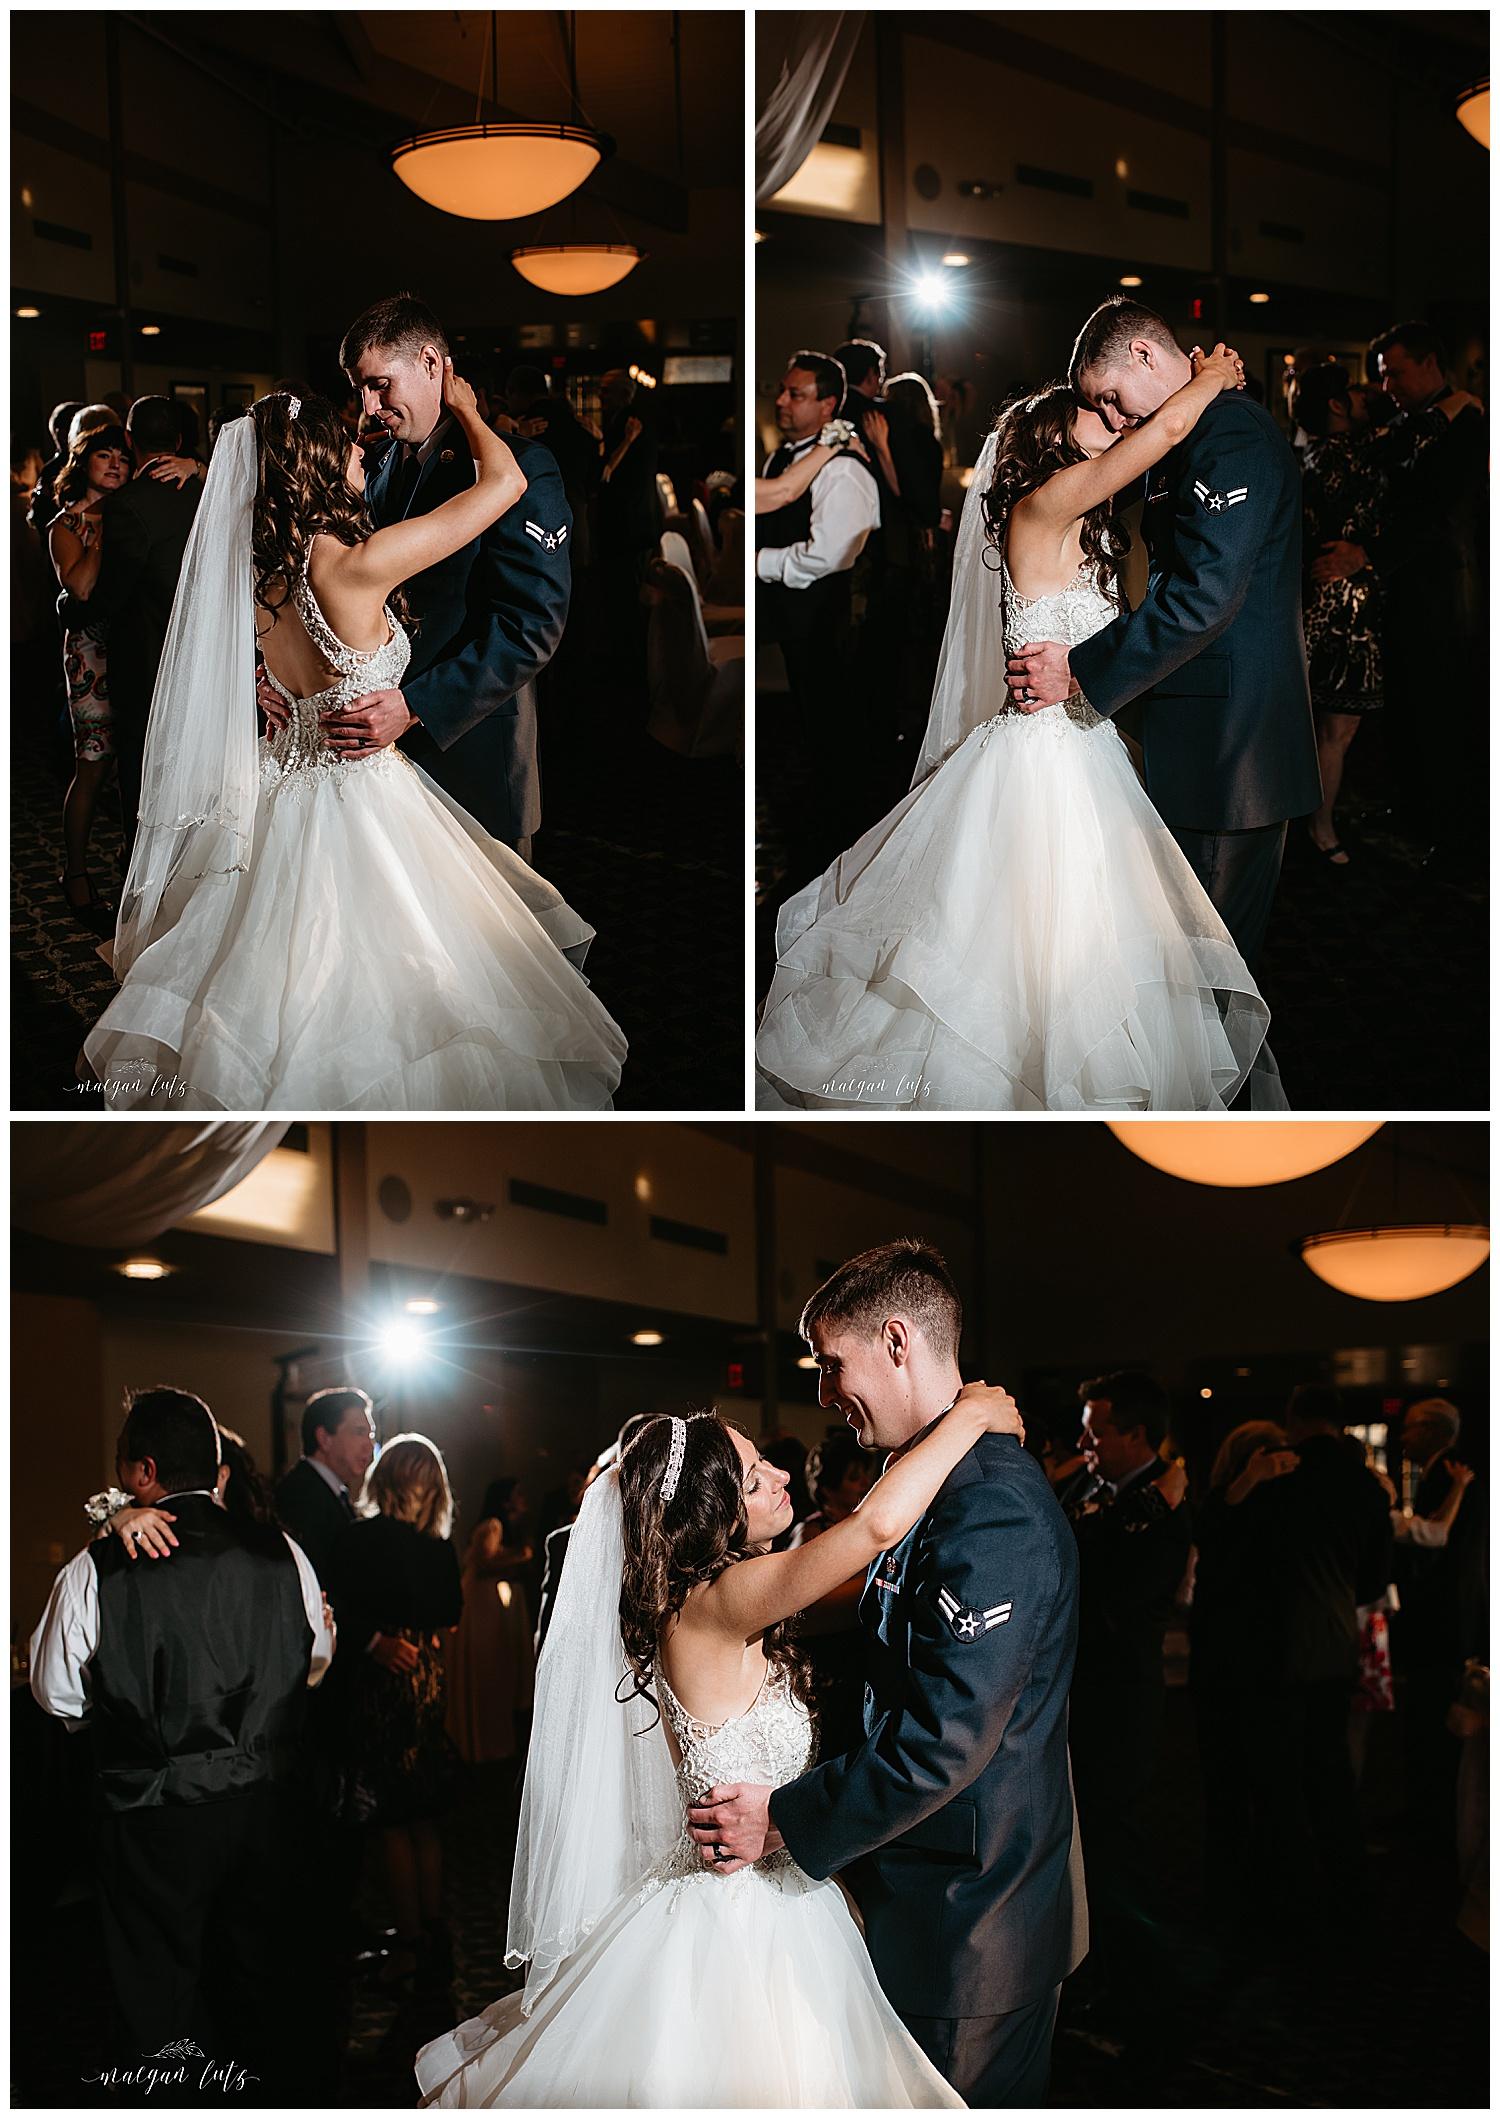 NEPA-Lehigh-Valley-Wedding-Photographer-at-Glen-Oak-Country-Club-Clarks-Summit-PA_0061.jpg